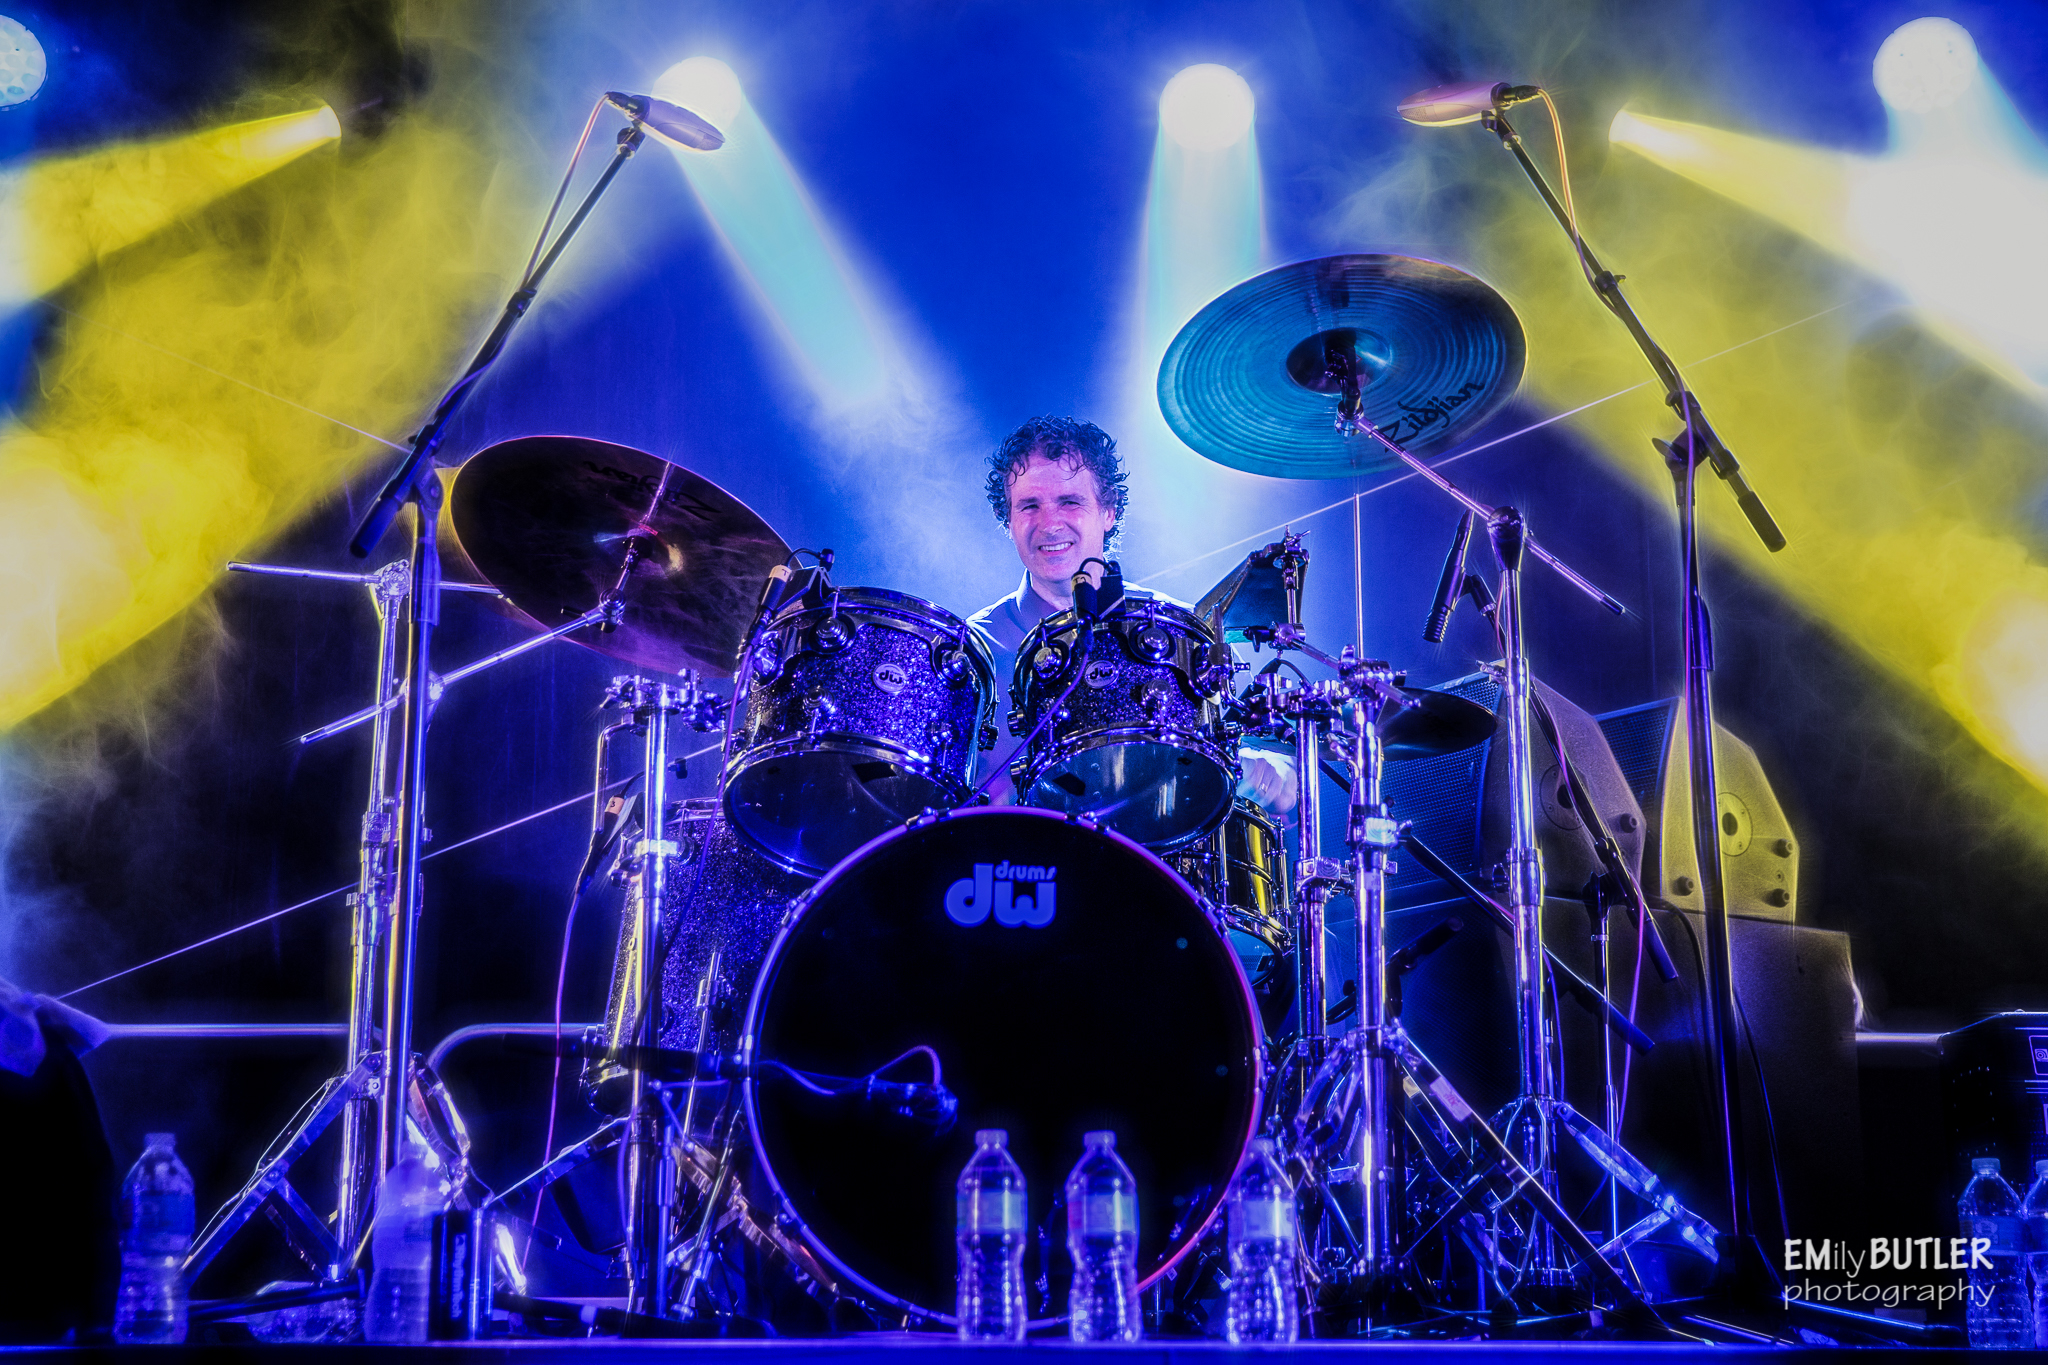 Geoff - Drums